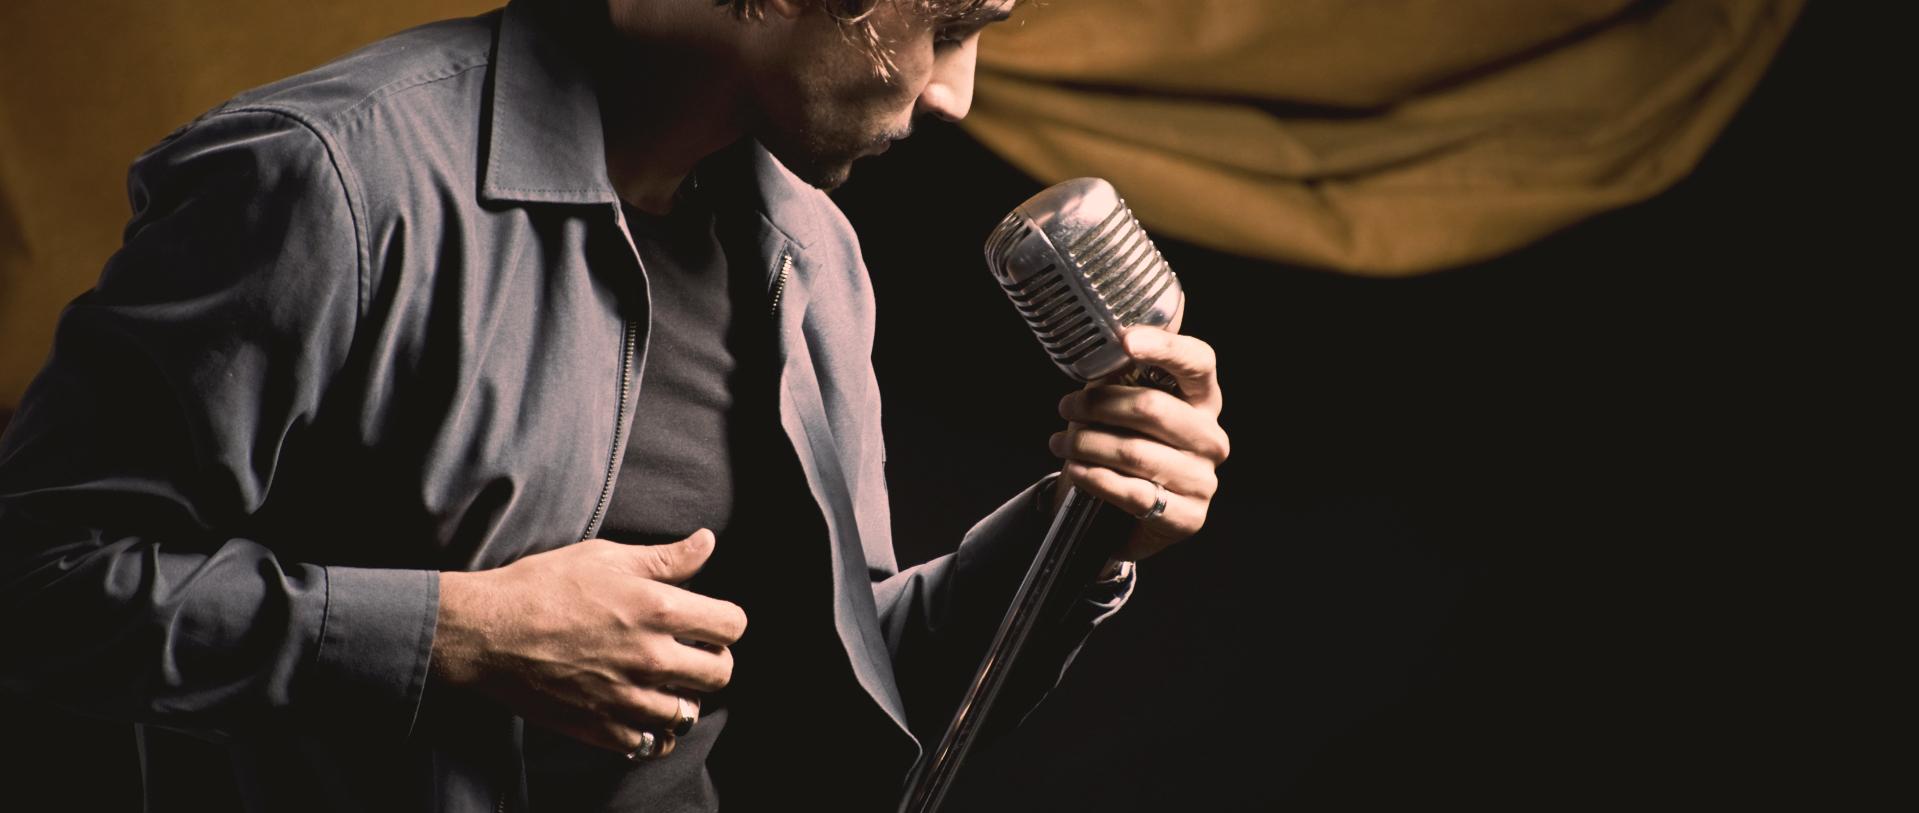 Singer Performing Live